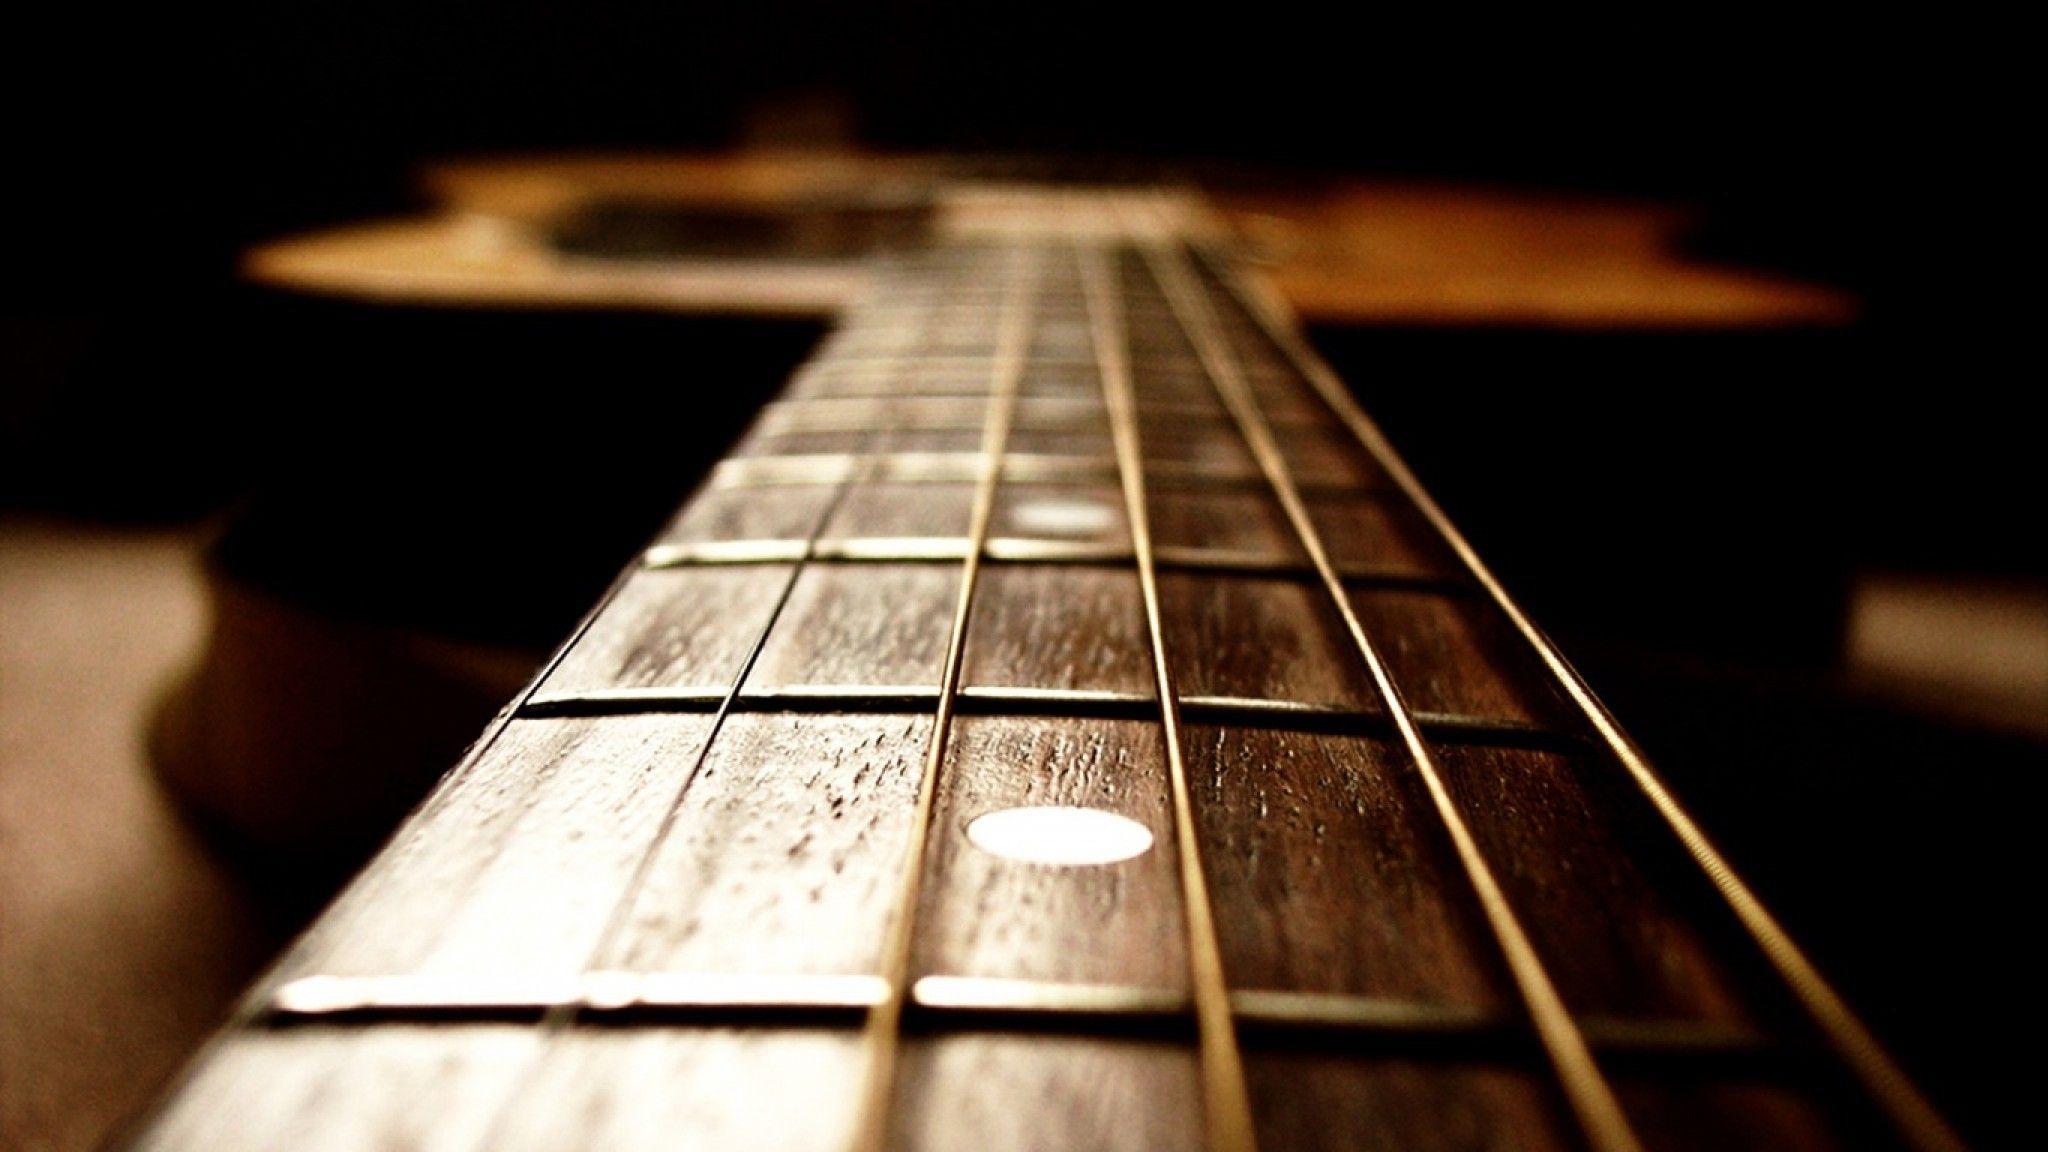 Guitarra Acustica Primer Hd Wallpaper Guitarra Acustica Tipos De Guitarras Guitarras